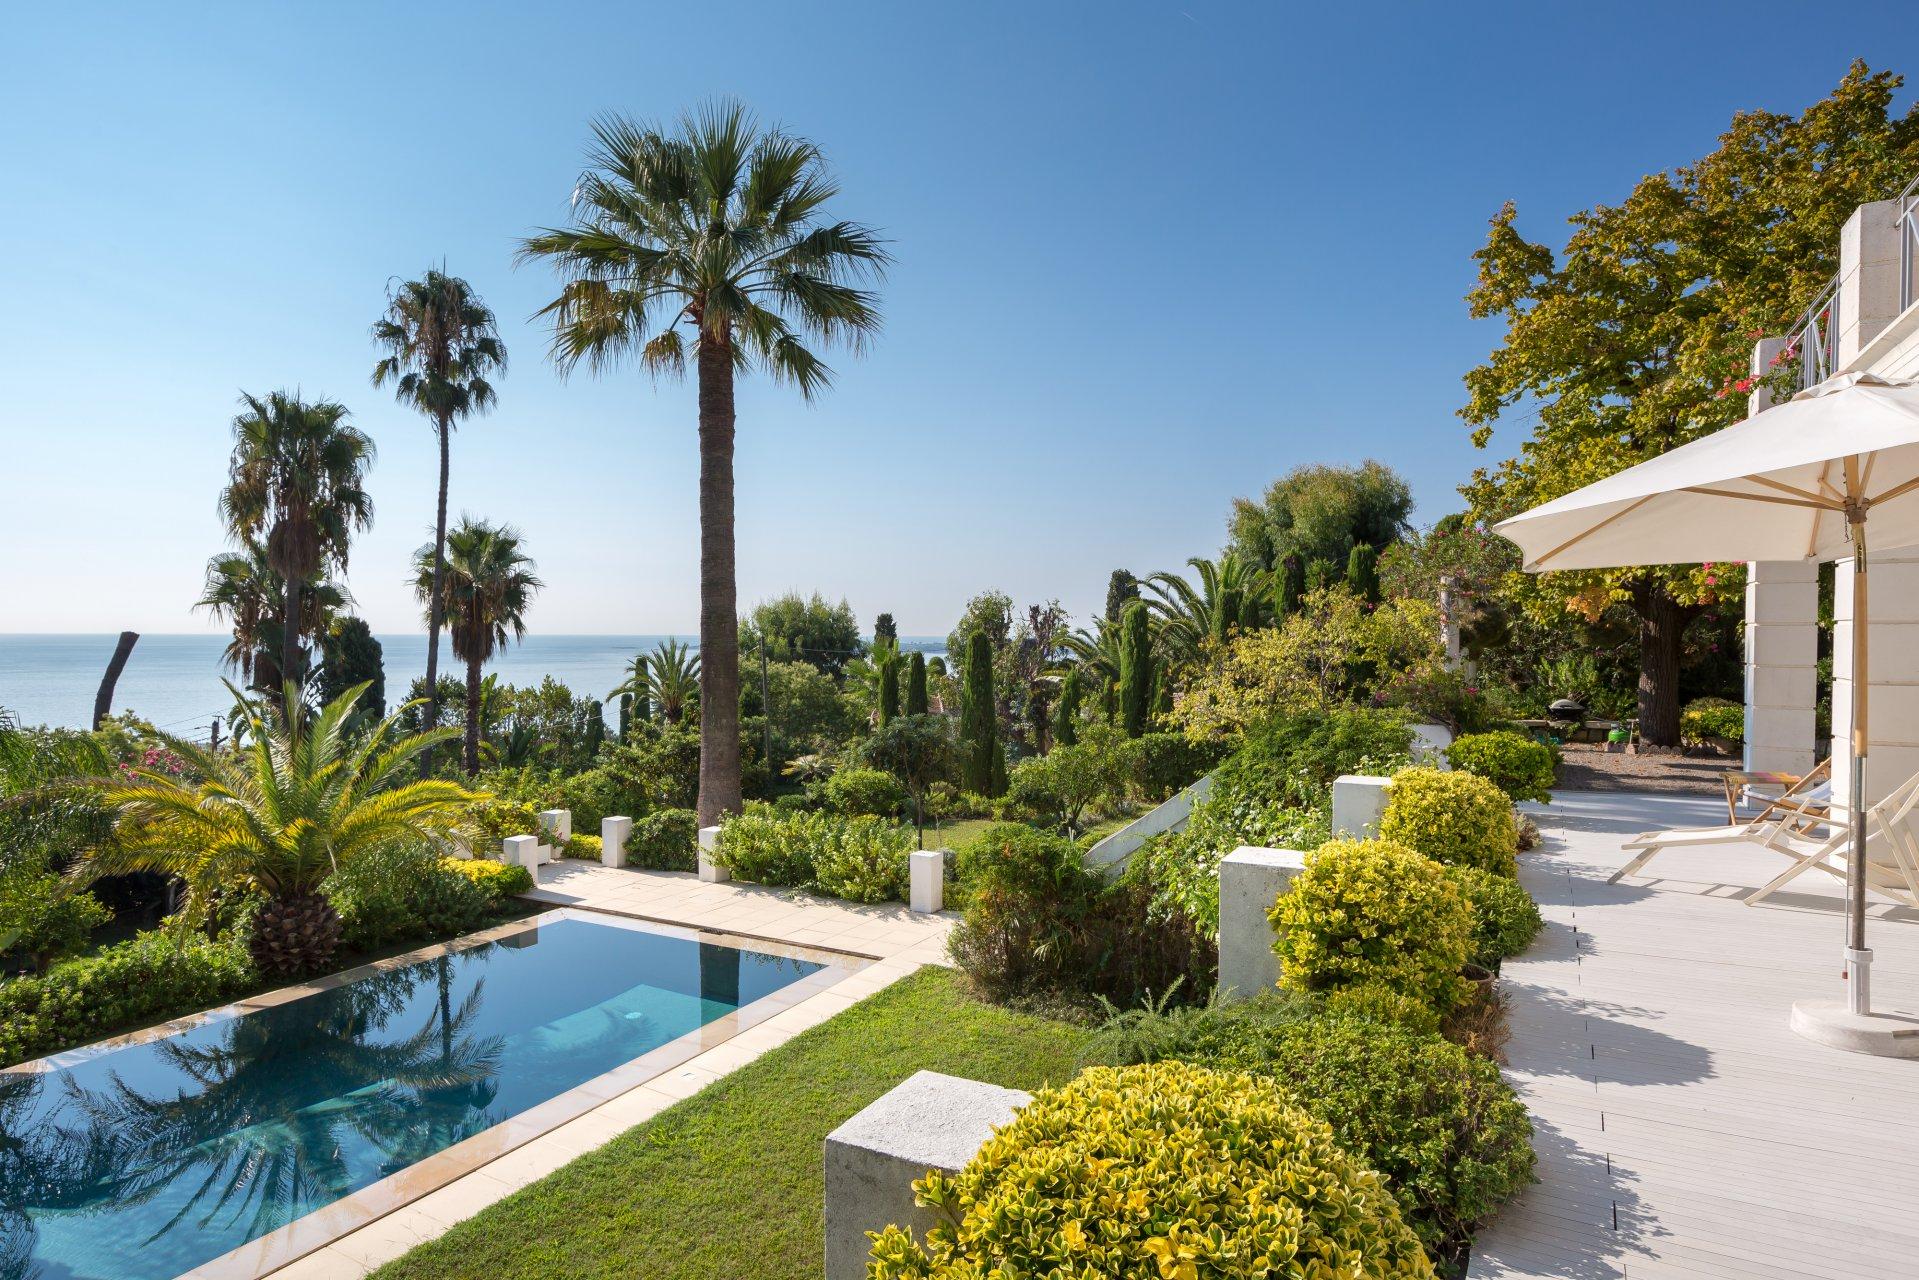 Ad Sale Villa Cannes  06400   4 Rooms Ref V5310ca